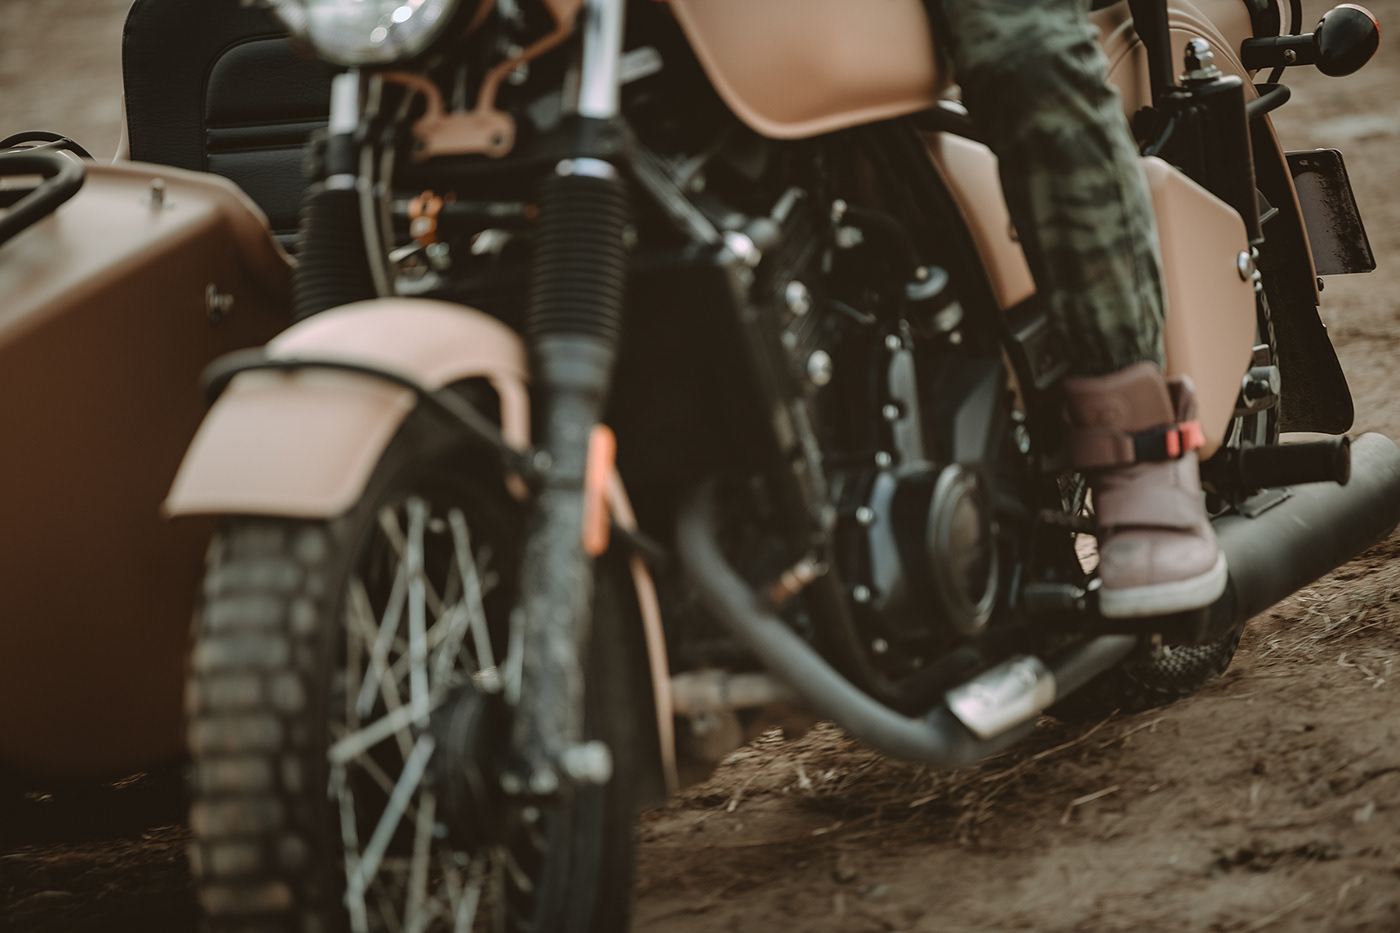 Travel art humane Portraiture Urban motorcycle